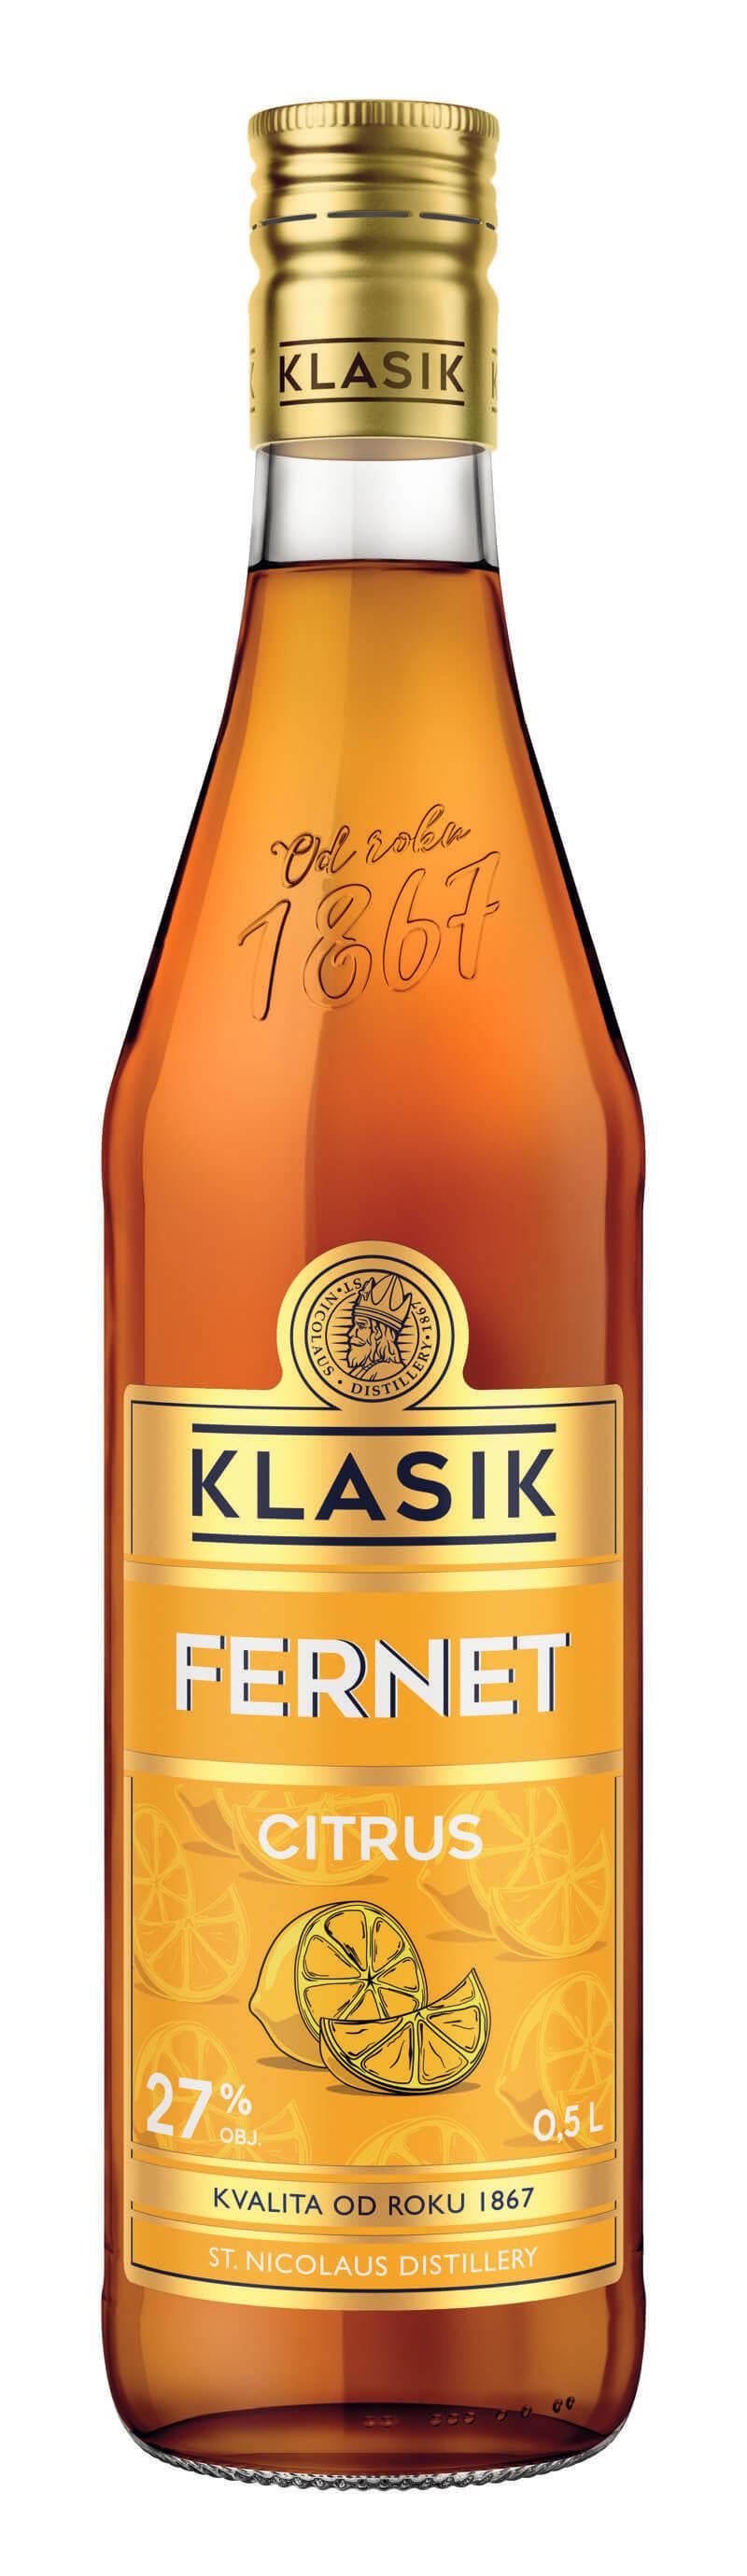 KLASIK Fernet Citrus 27% 0,5l